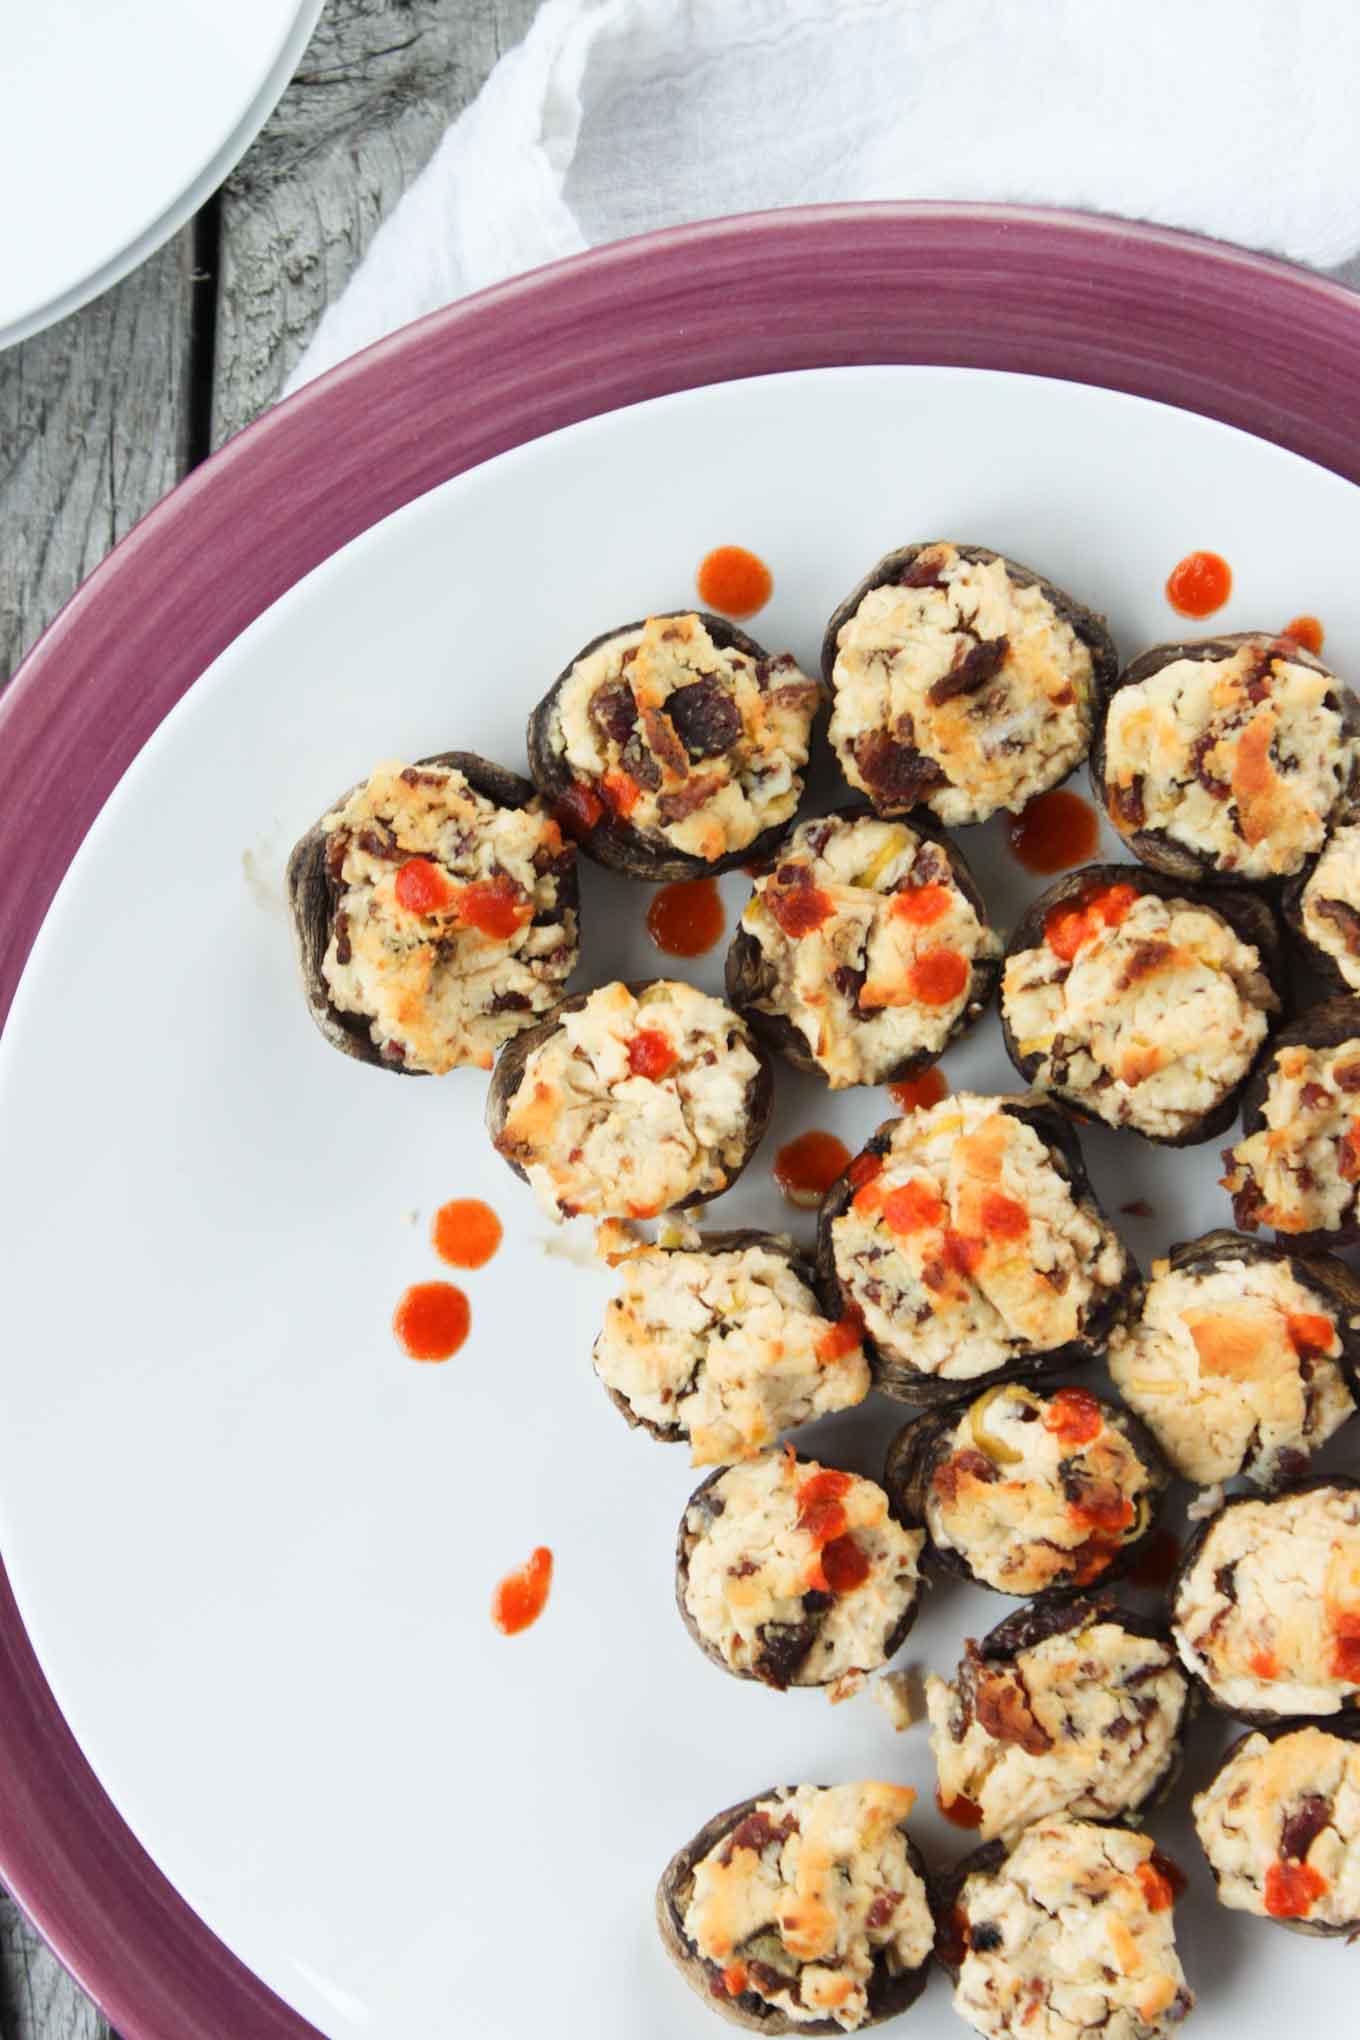 'Cheesy' Sriracha and Bacon Stuffed Mushrooms | simplerootswellness.com